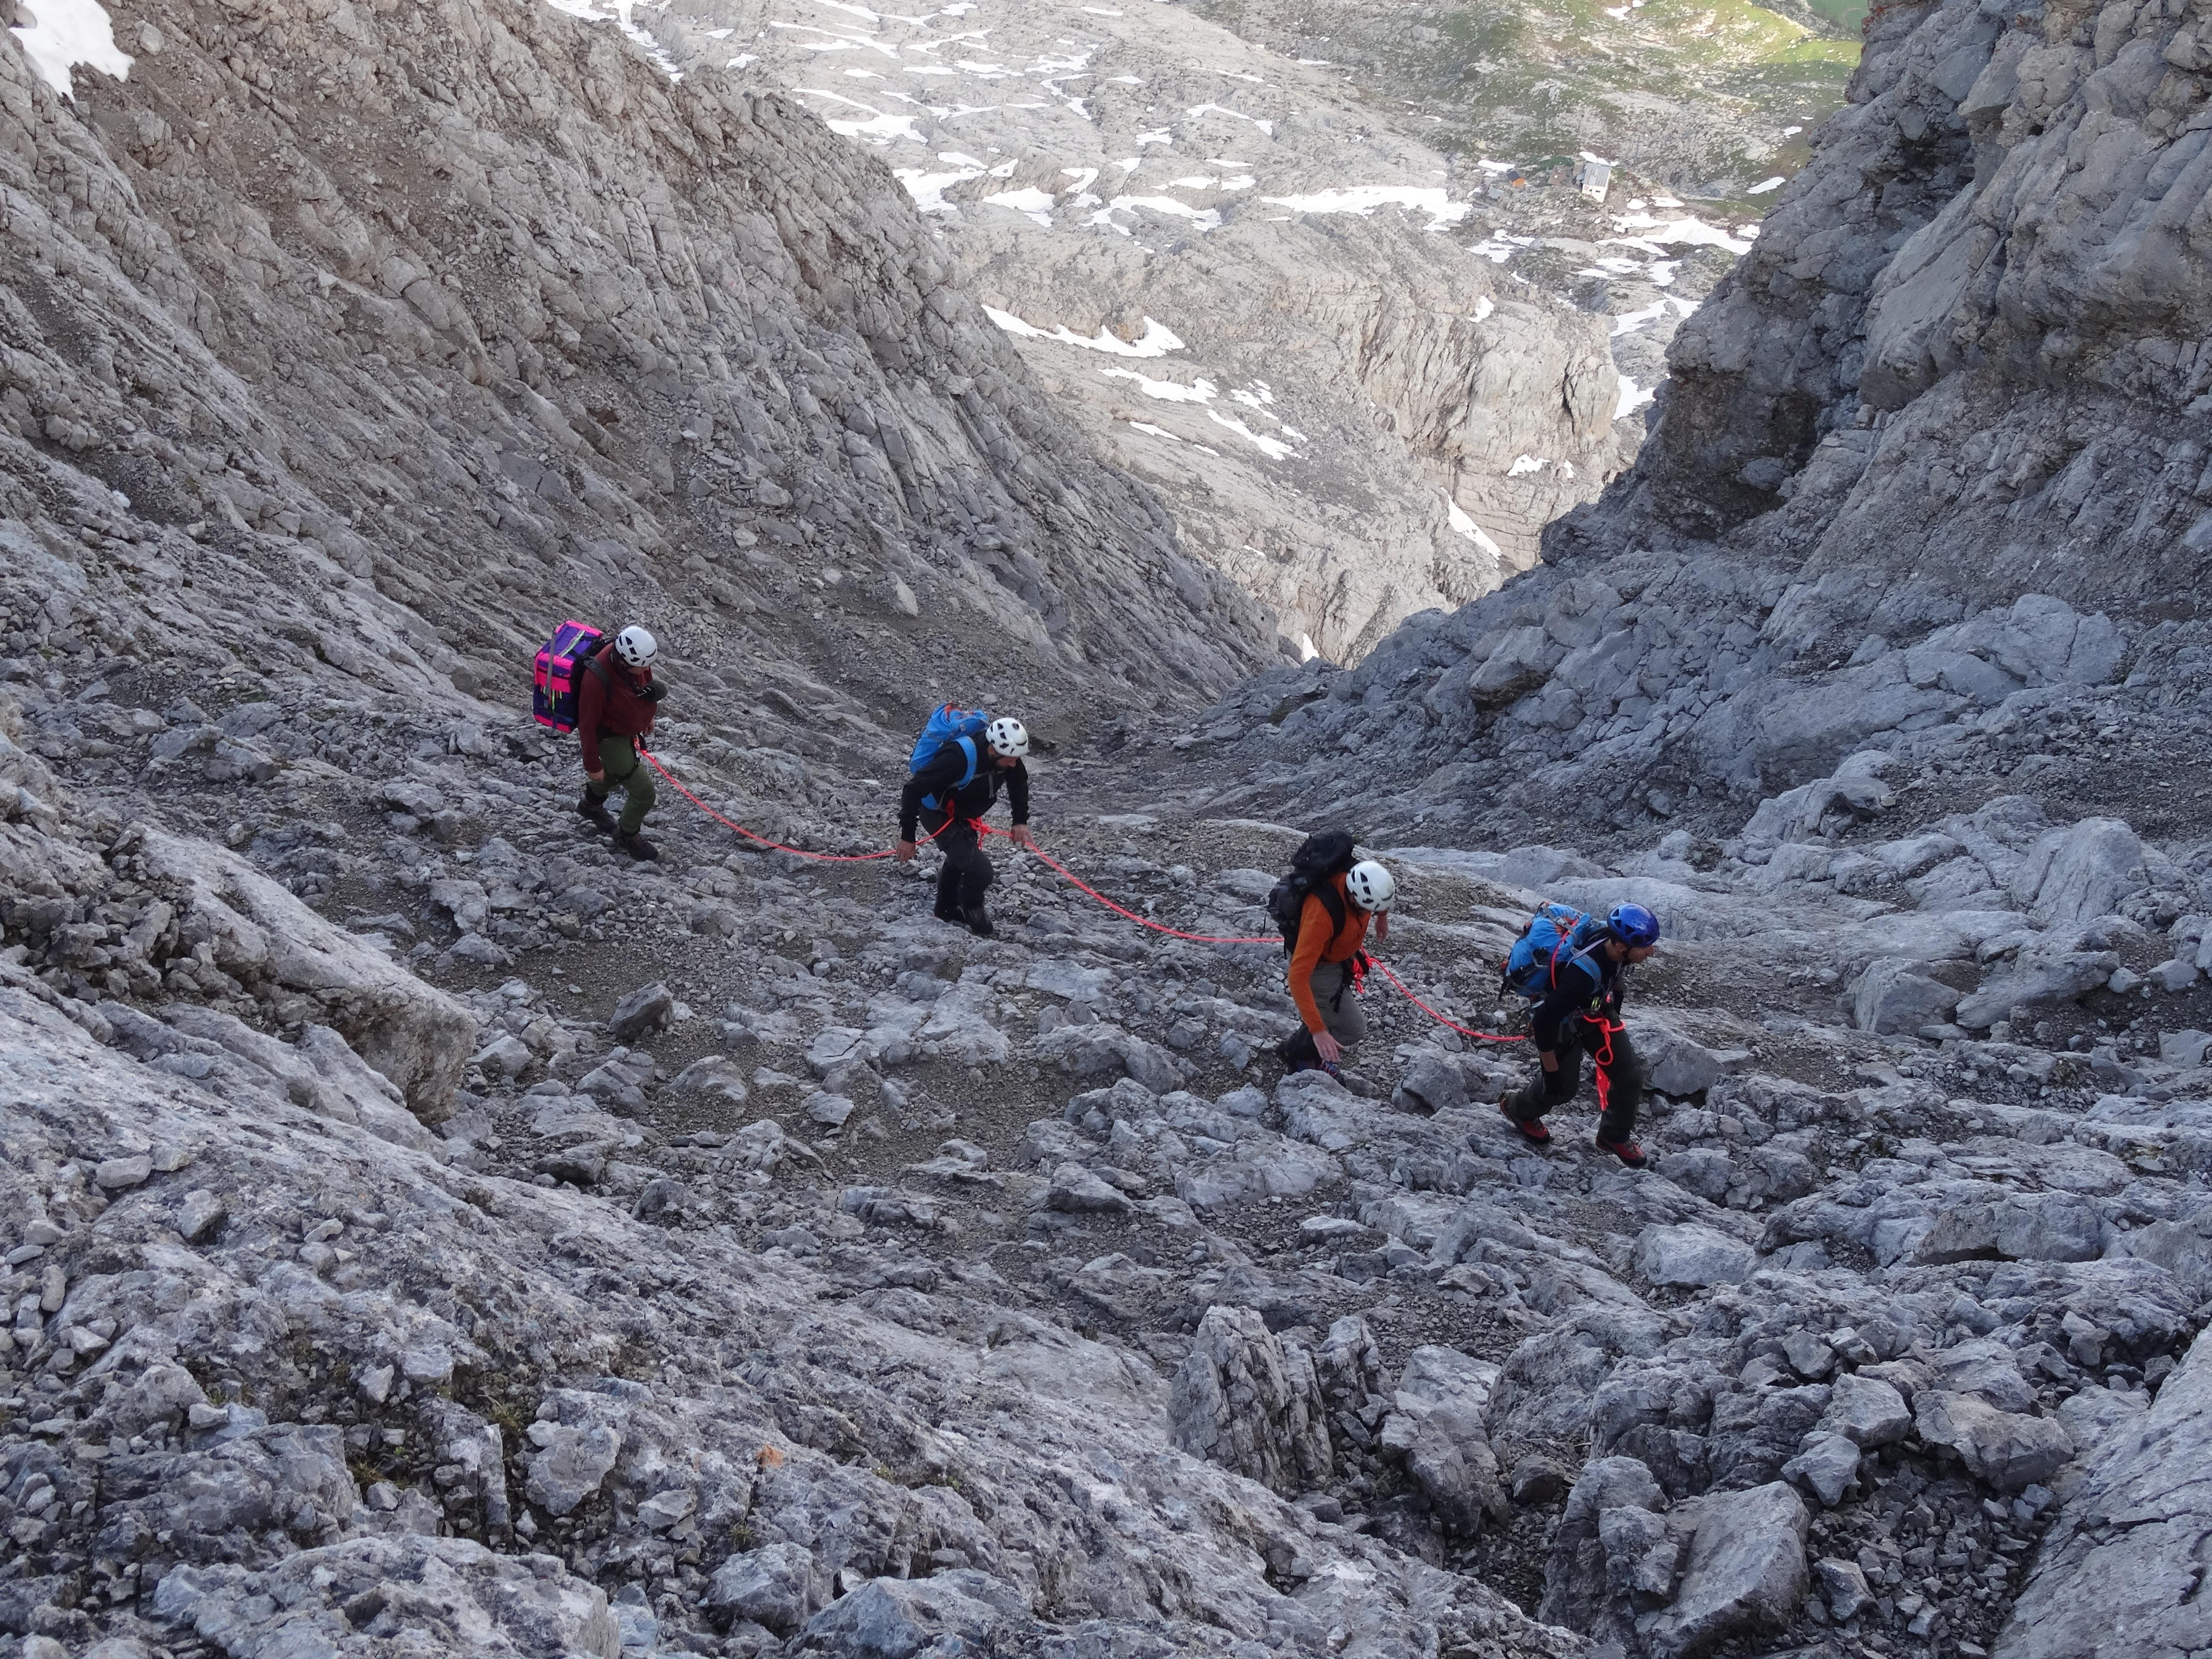 walking-mountain-group-people-hiking-adventure-mountain-range-recreation-climbing-extreme-sport-ridge-summit-mountaineering-geology-sports-climbers-moraine-confidence-geological-phenomen